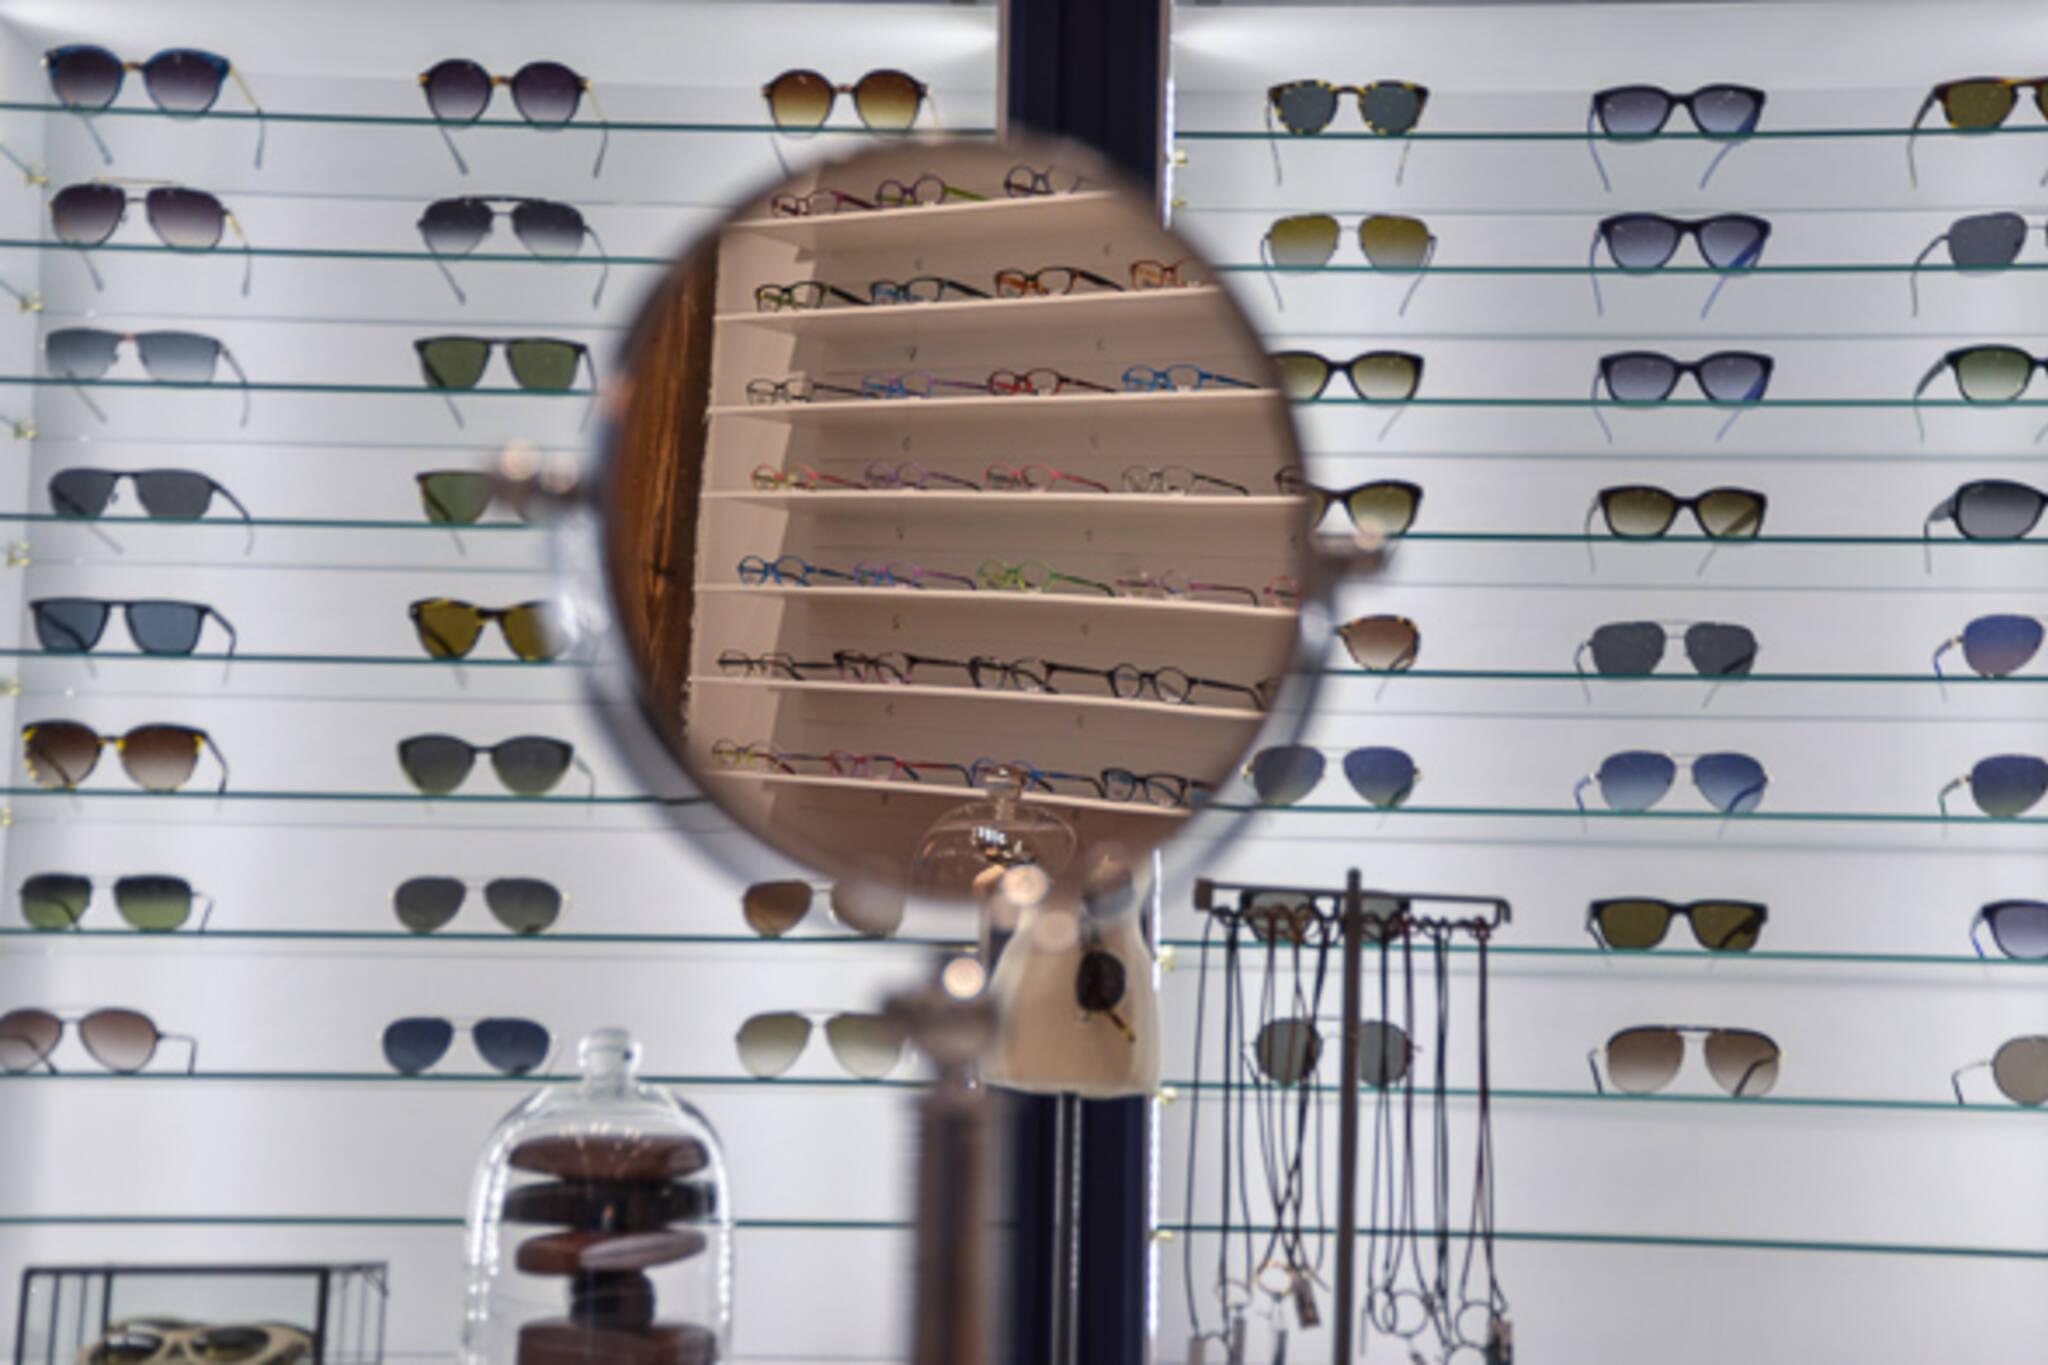 2b7dbcab50 Squint Eyewear - blogTO - Toronto